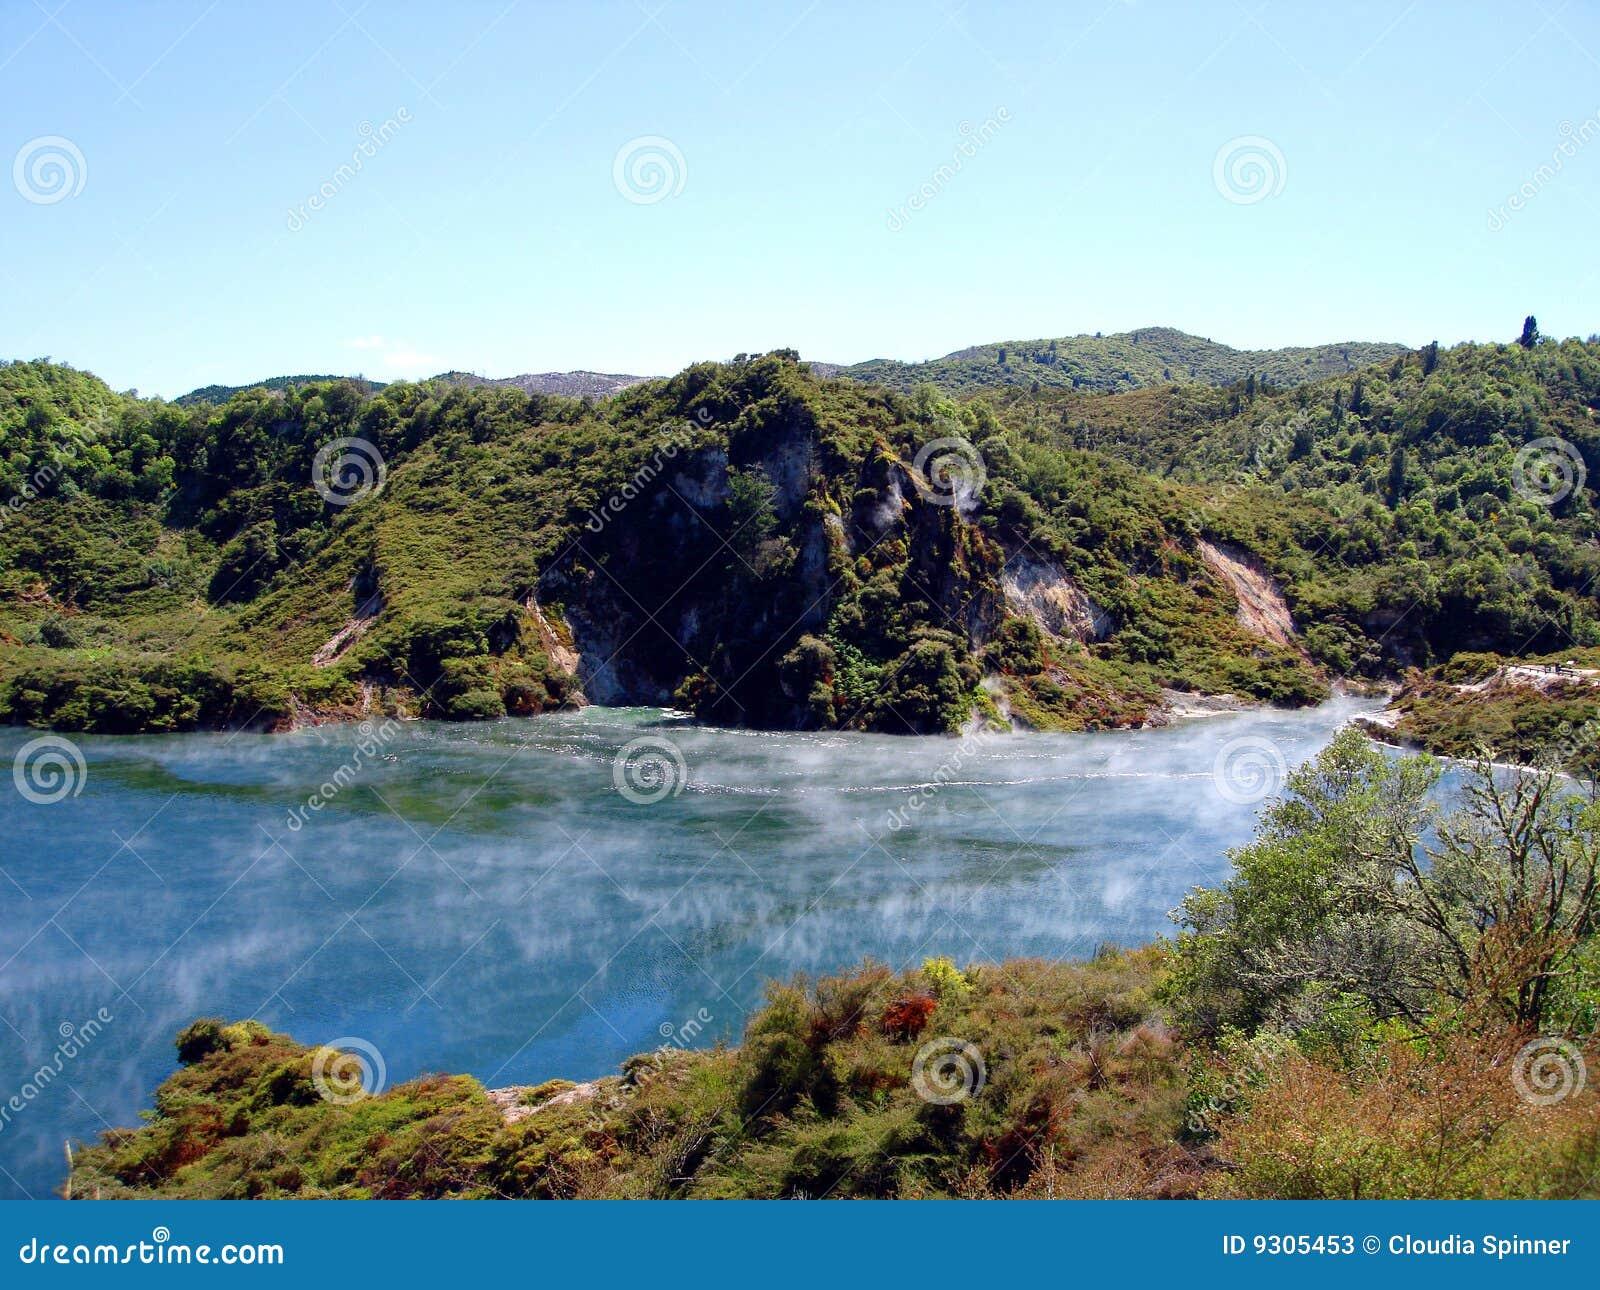 Geothermal Activity,Waimangu, Rotorua, New Zealand